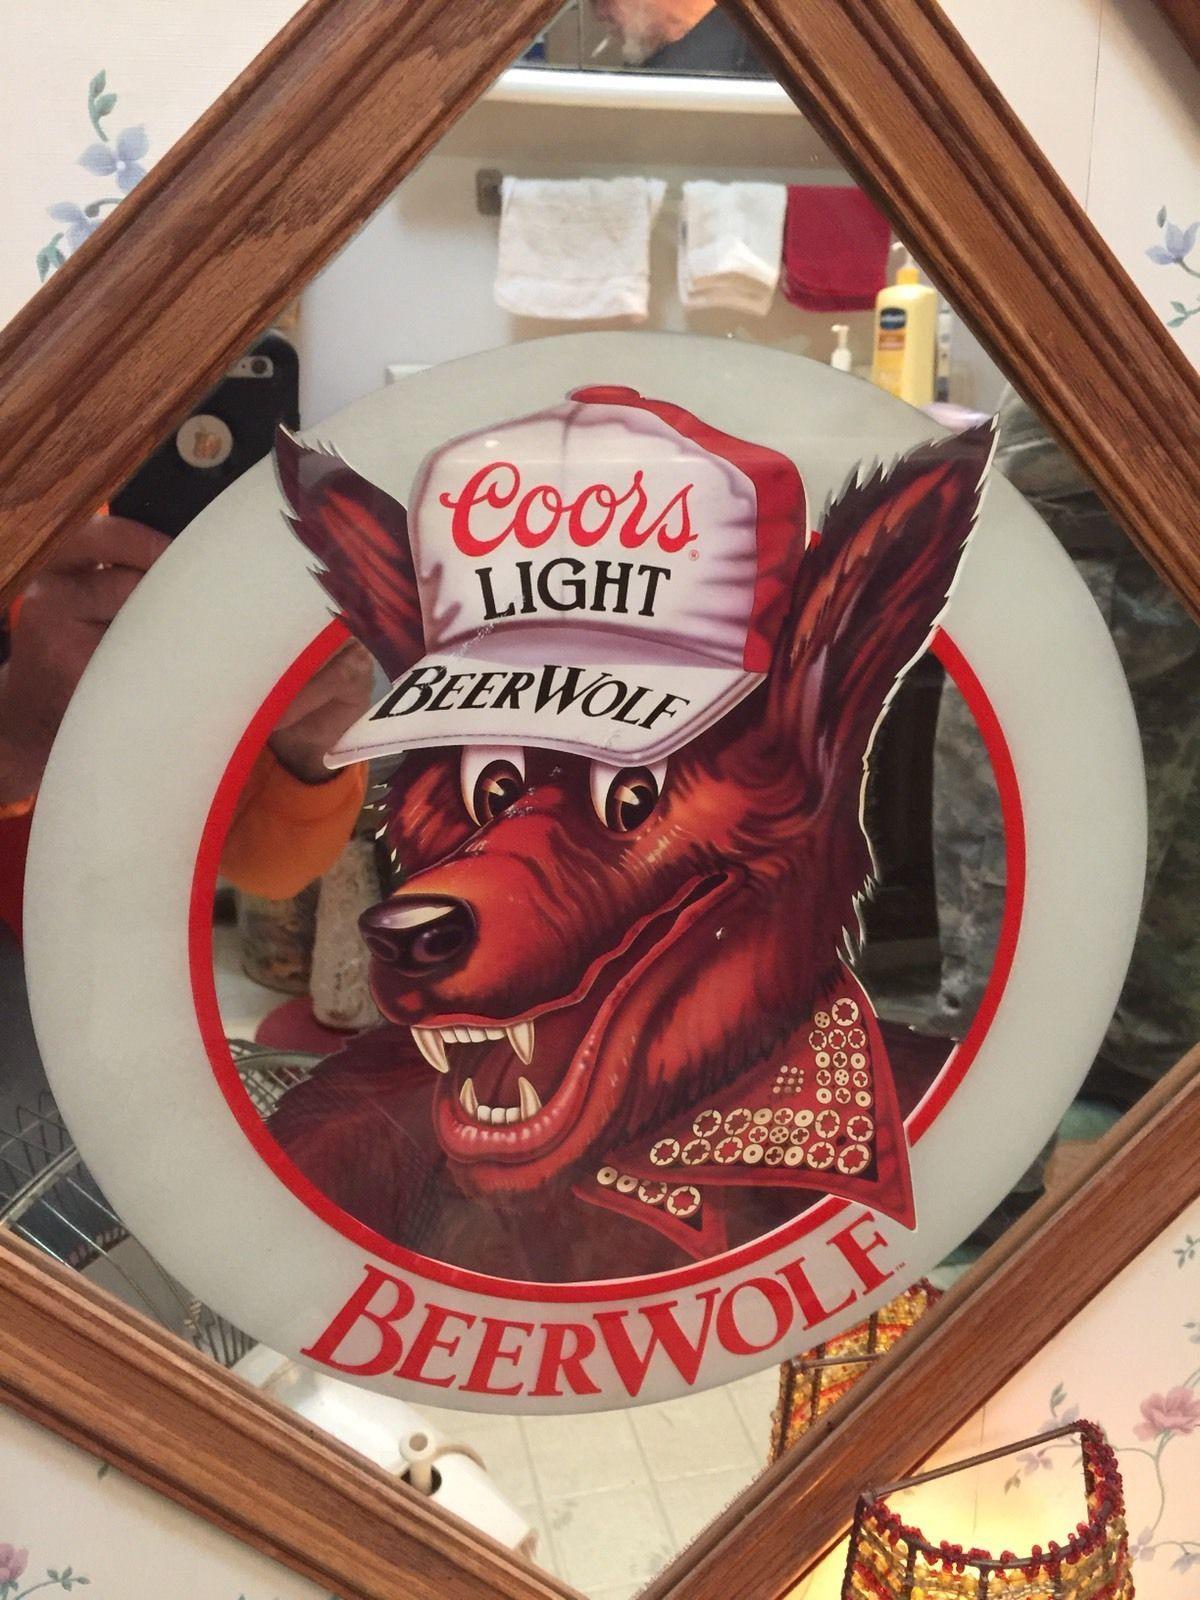 Coors light beer wolf beerwolf mirror sign bar pub man cave coors light beer wolf beerwolf mirror sign bar pub man aloadofball Image collections